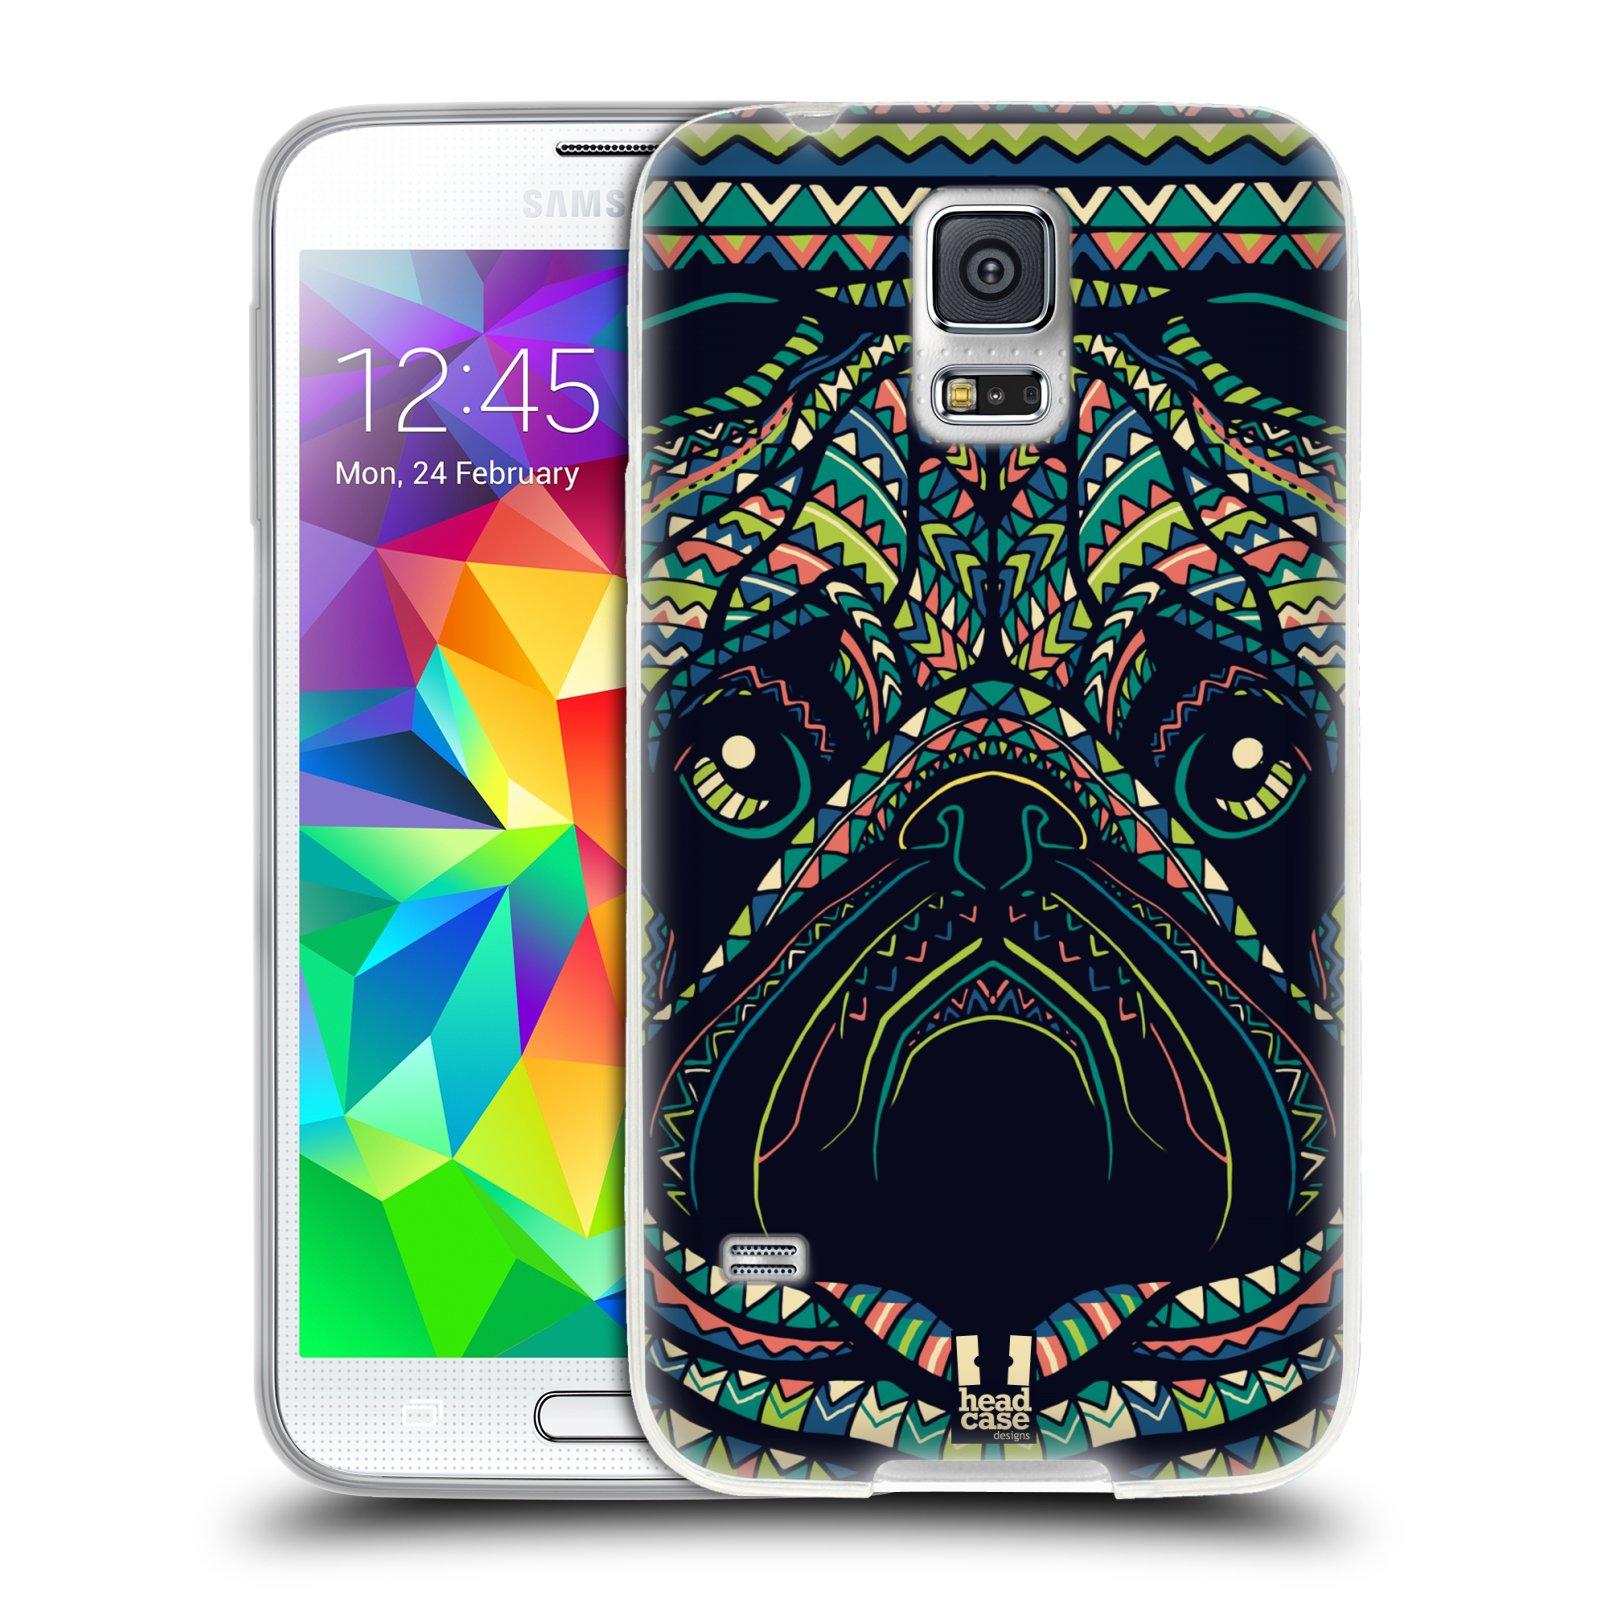 Silikonové pouzdro na mobil Samsung Galaxy S5 HEAD CASE AZTEC MOPS